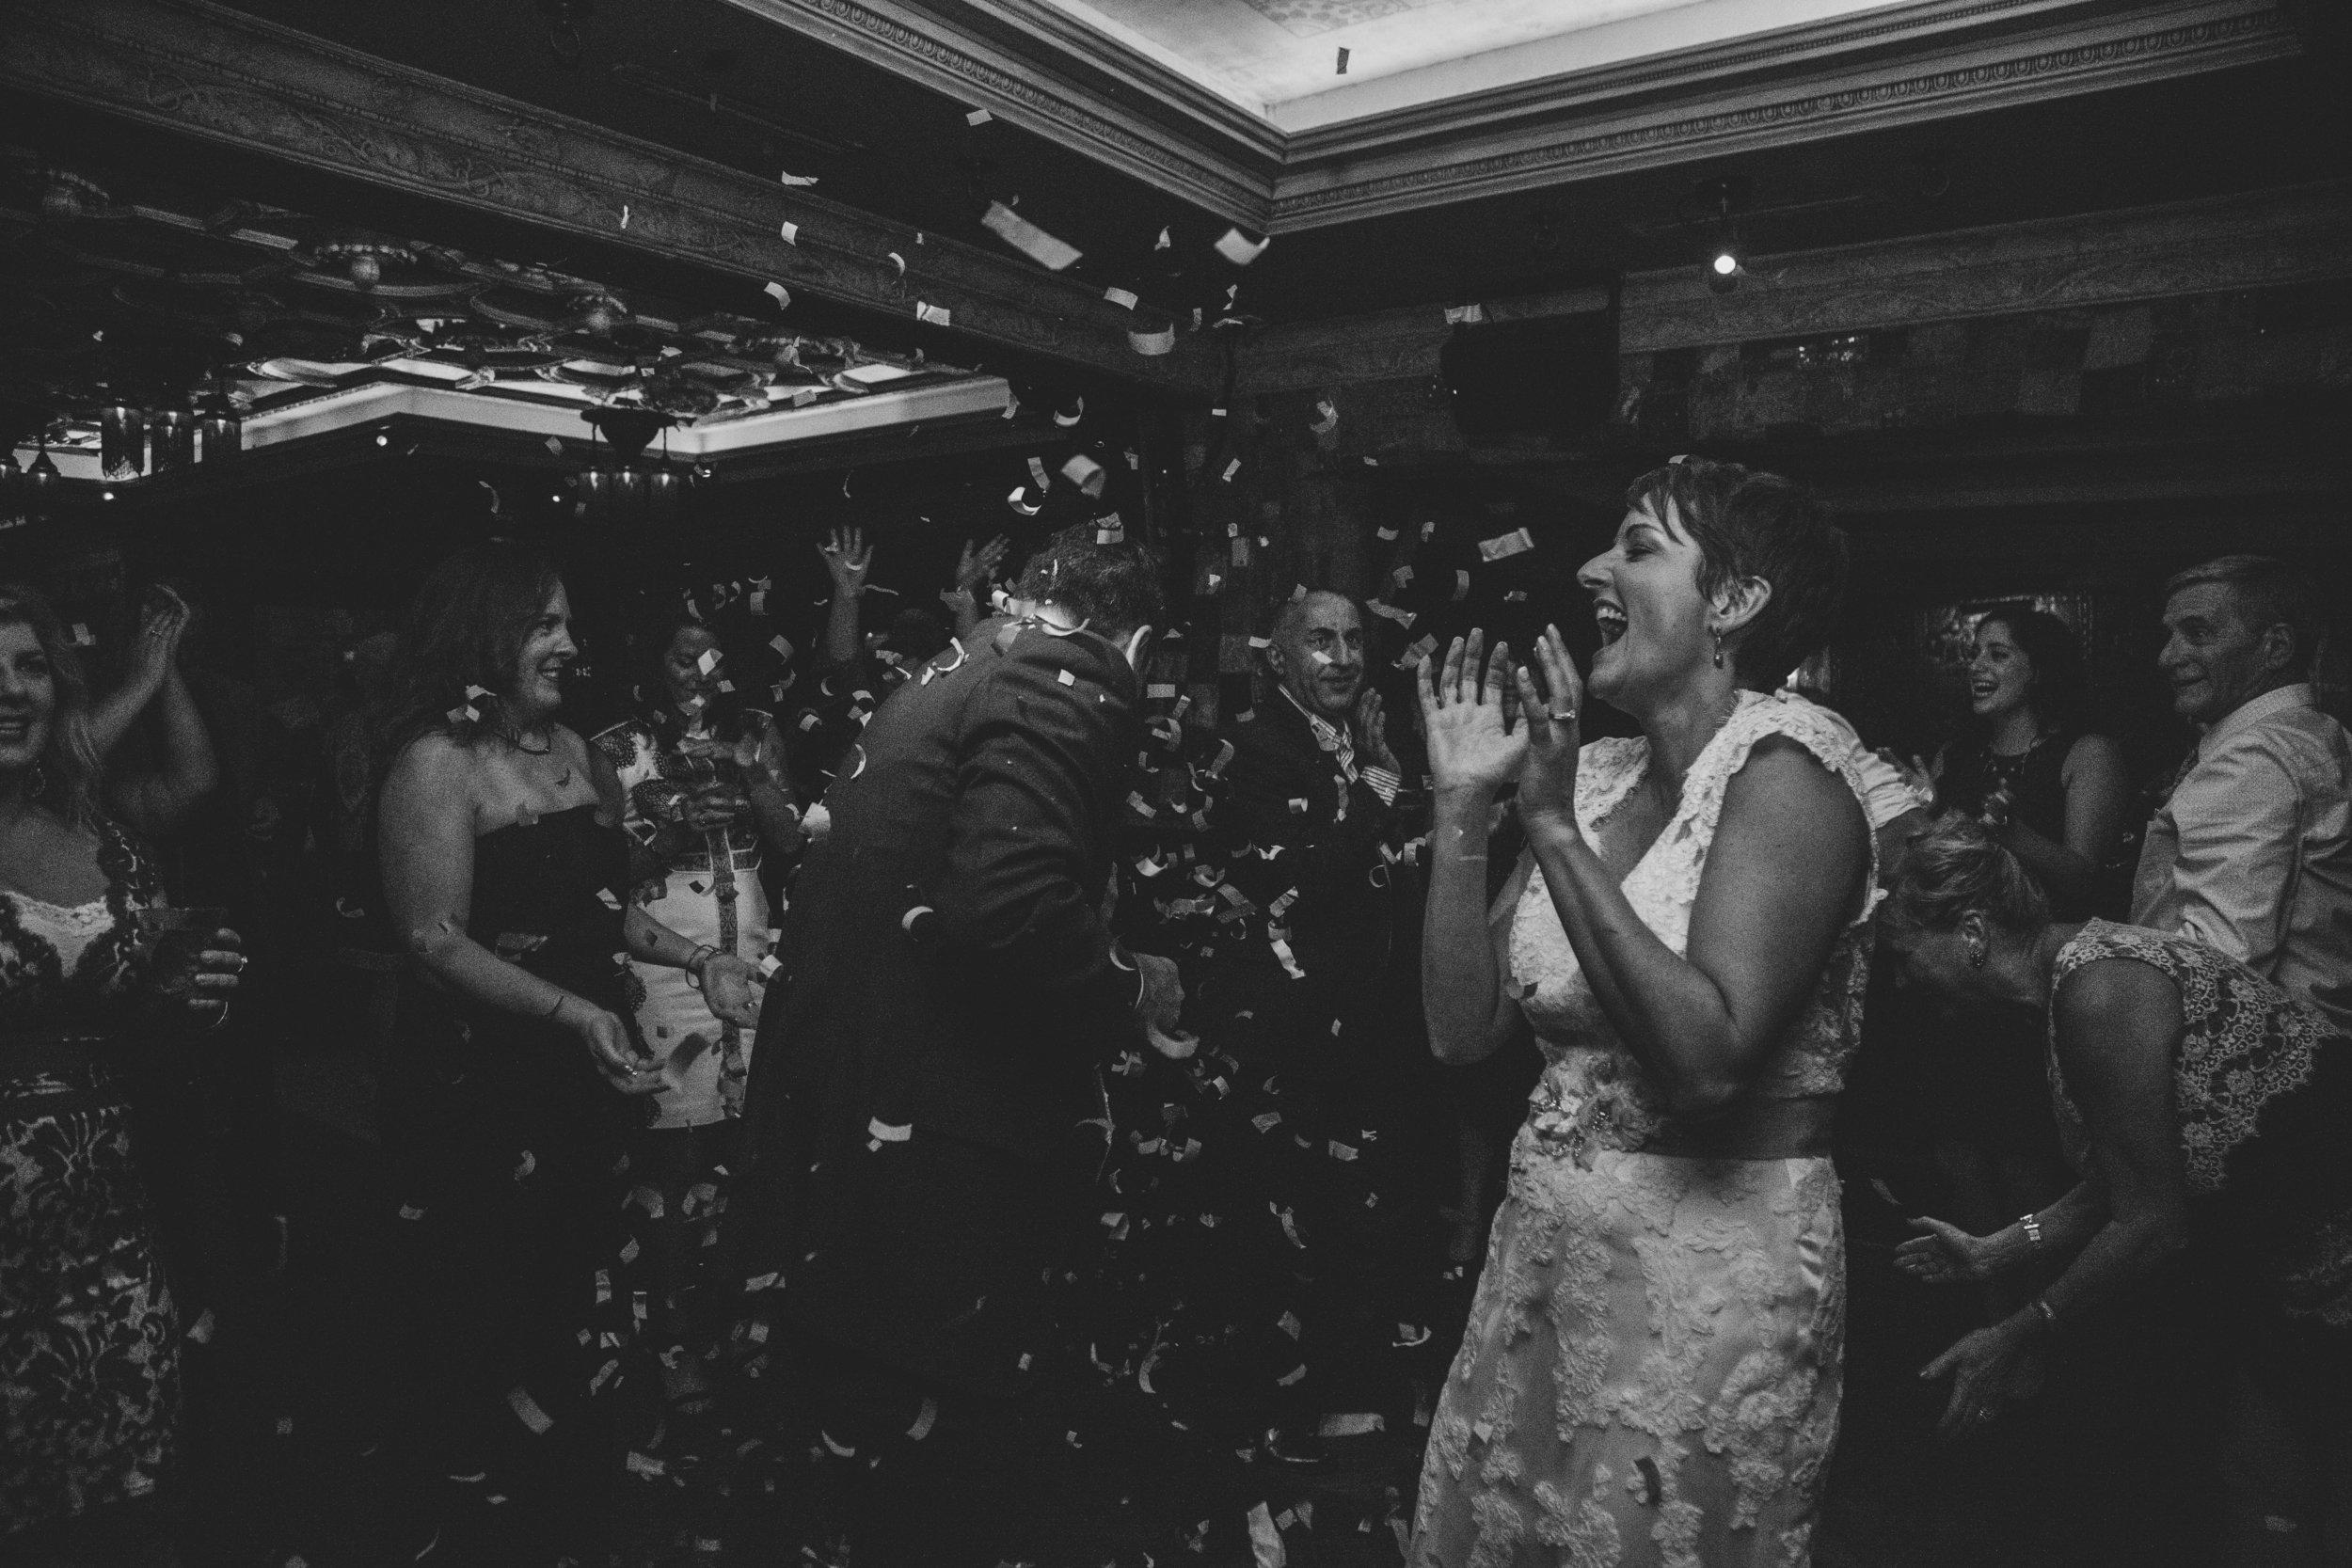 ATGI_Kat and Gabe Wedding 2016_2S8A6241.jpg